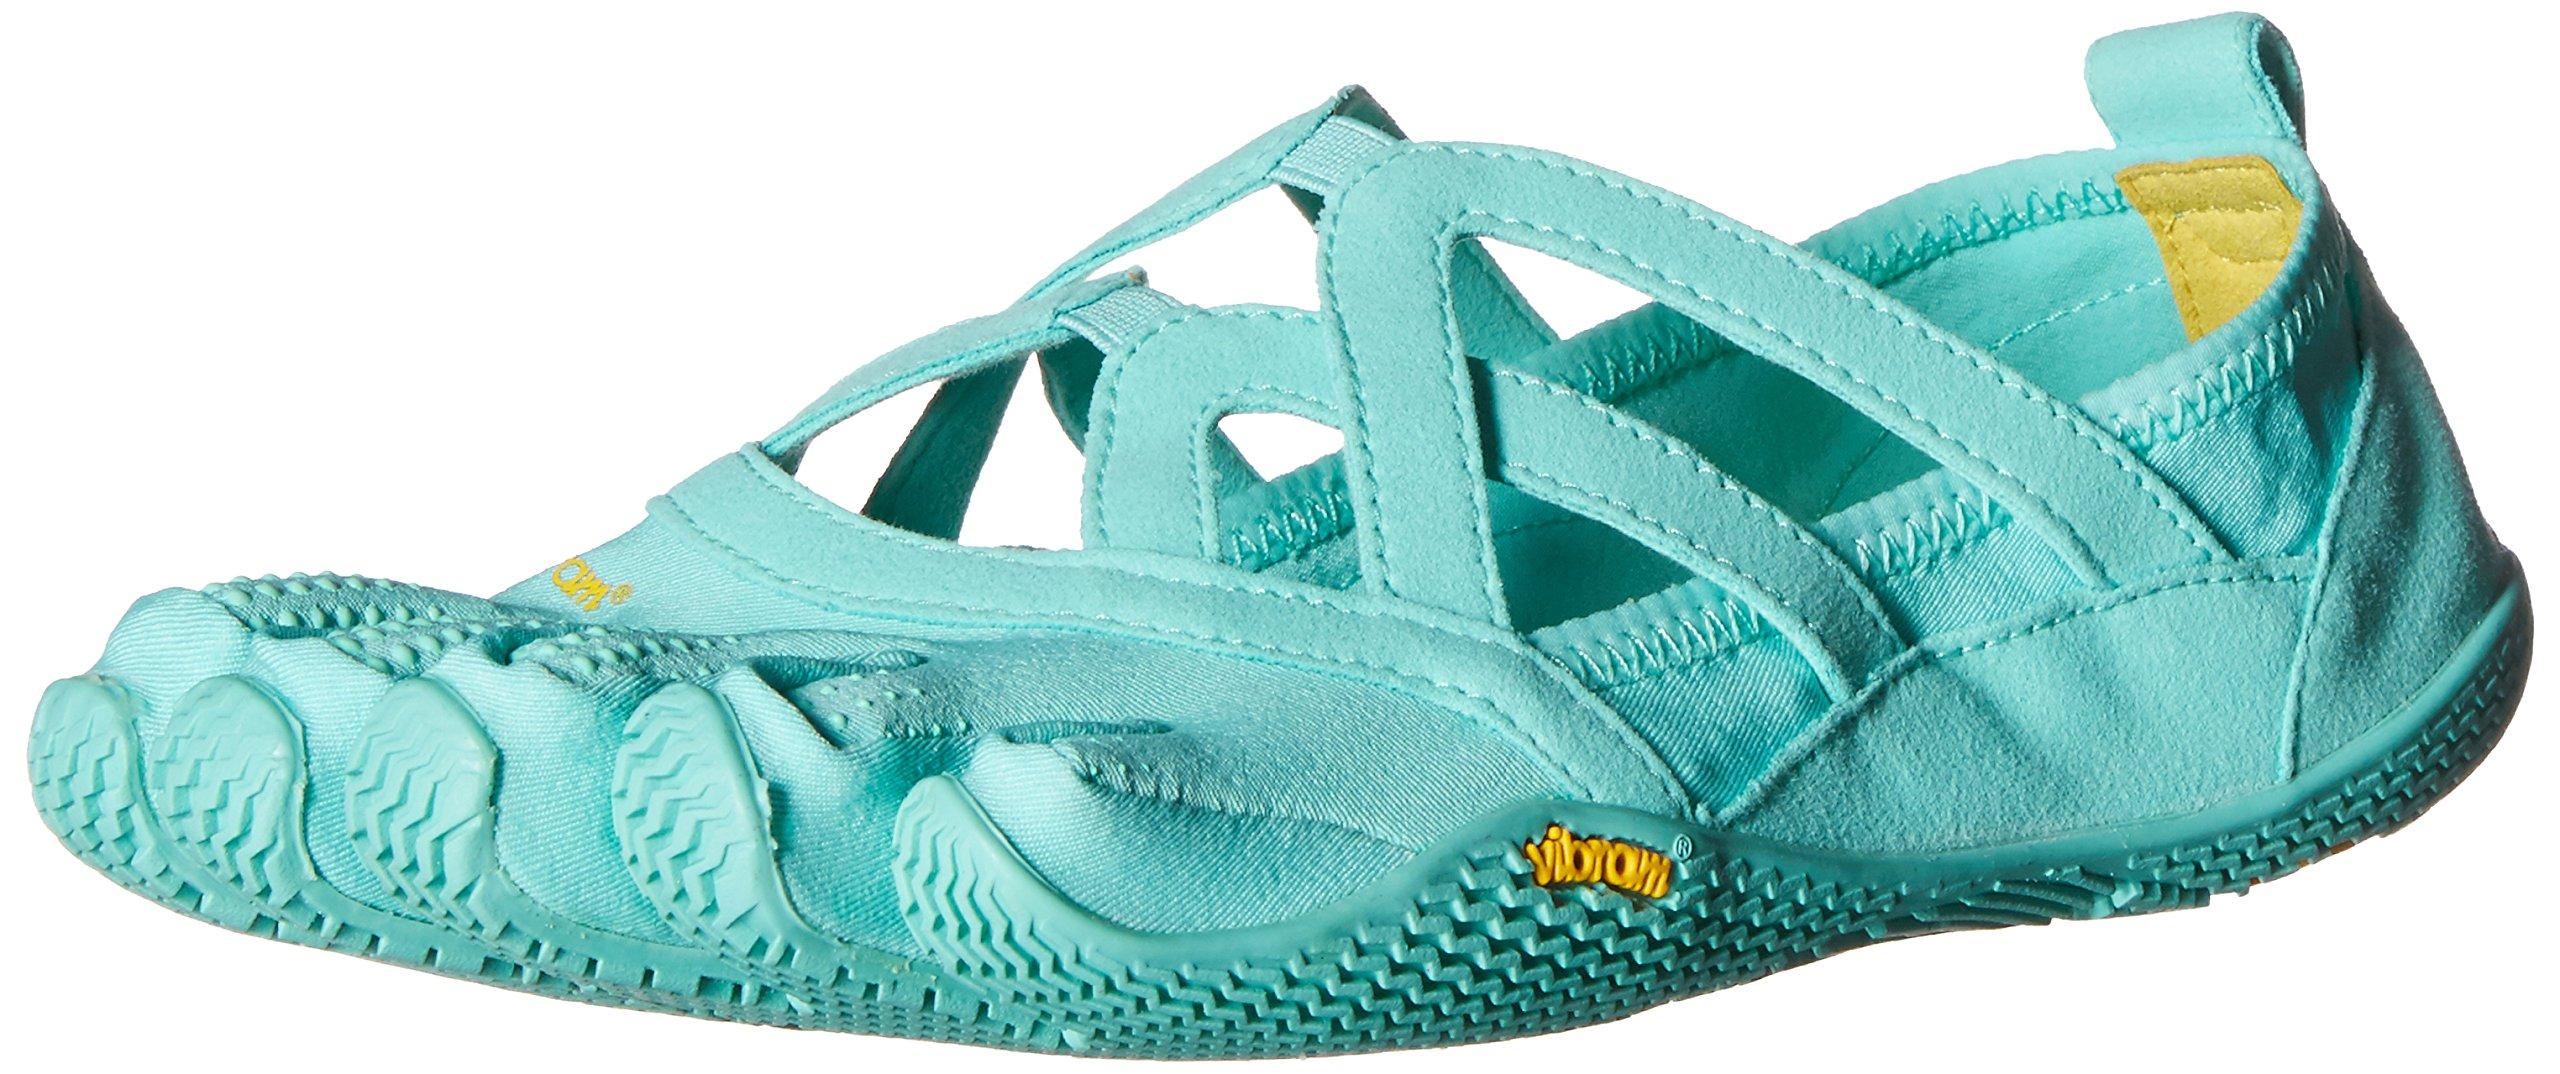 Vibram Women's Alitza Loop Fitness and Yoga Shoe, Mint, 36 EU/6 M US